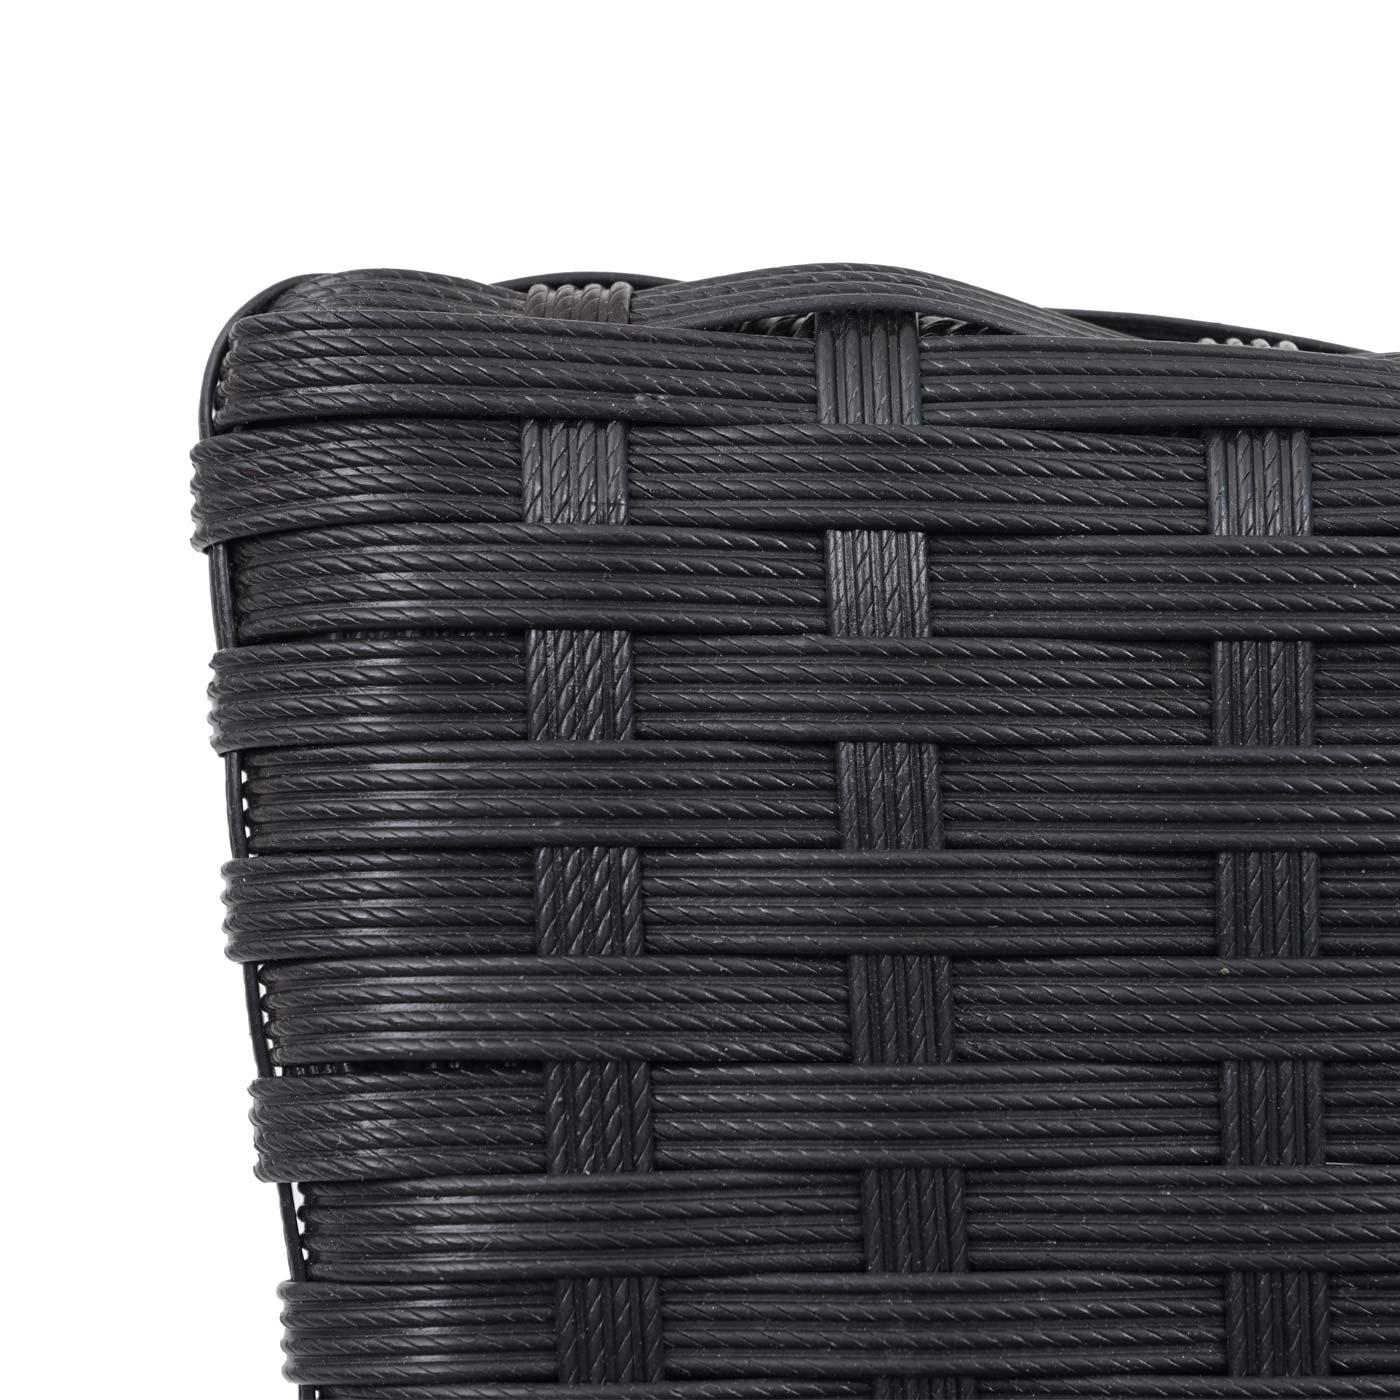 2xPoly-Rattan Stuhl HWC-G19 Detail Rückenlehne